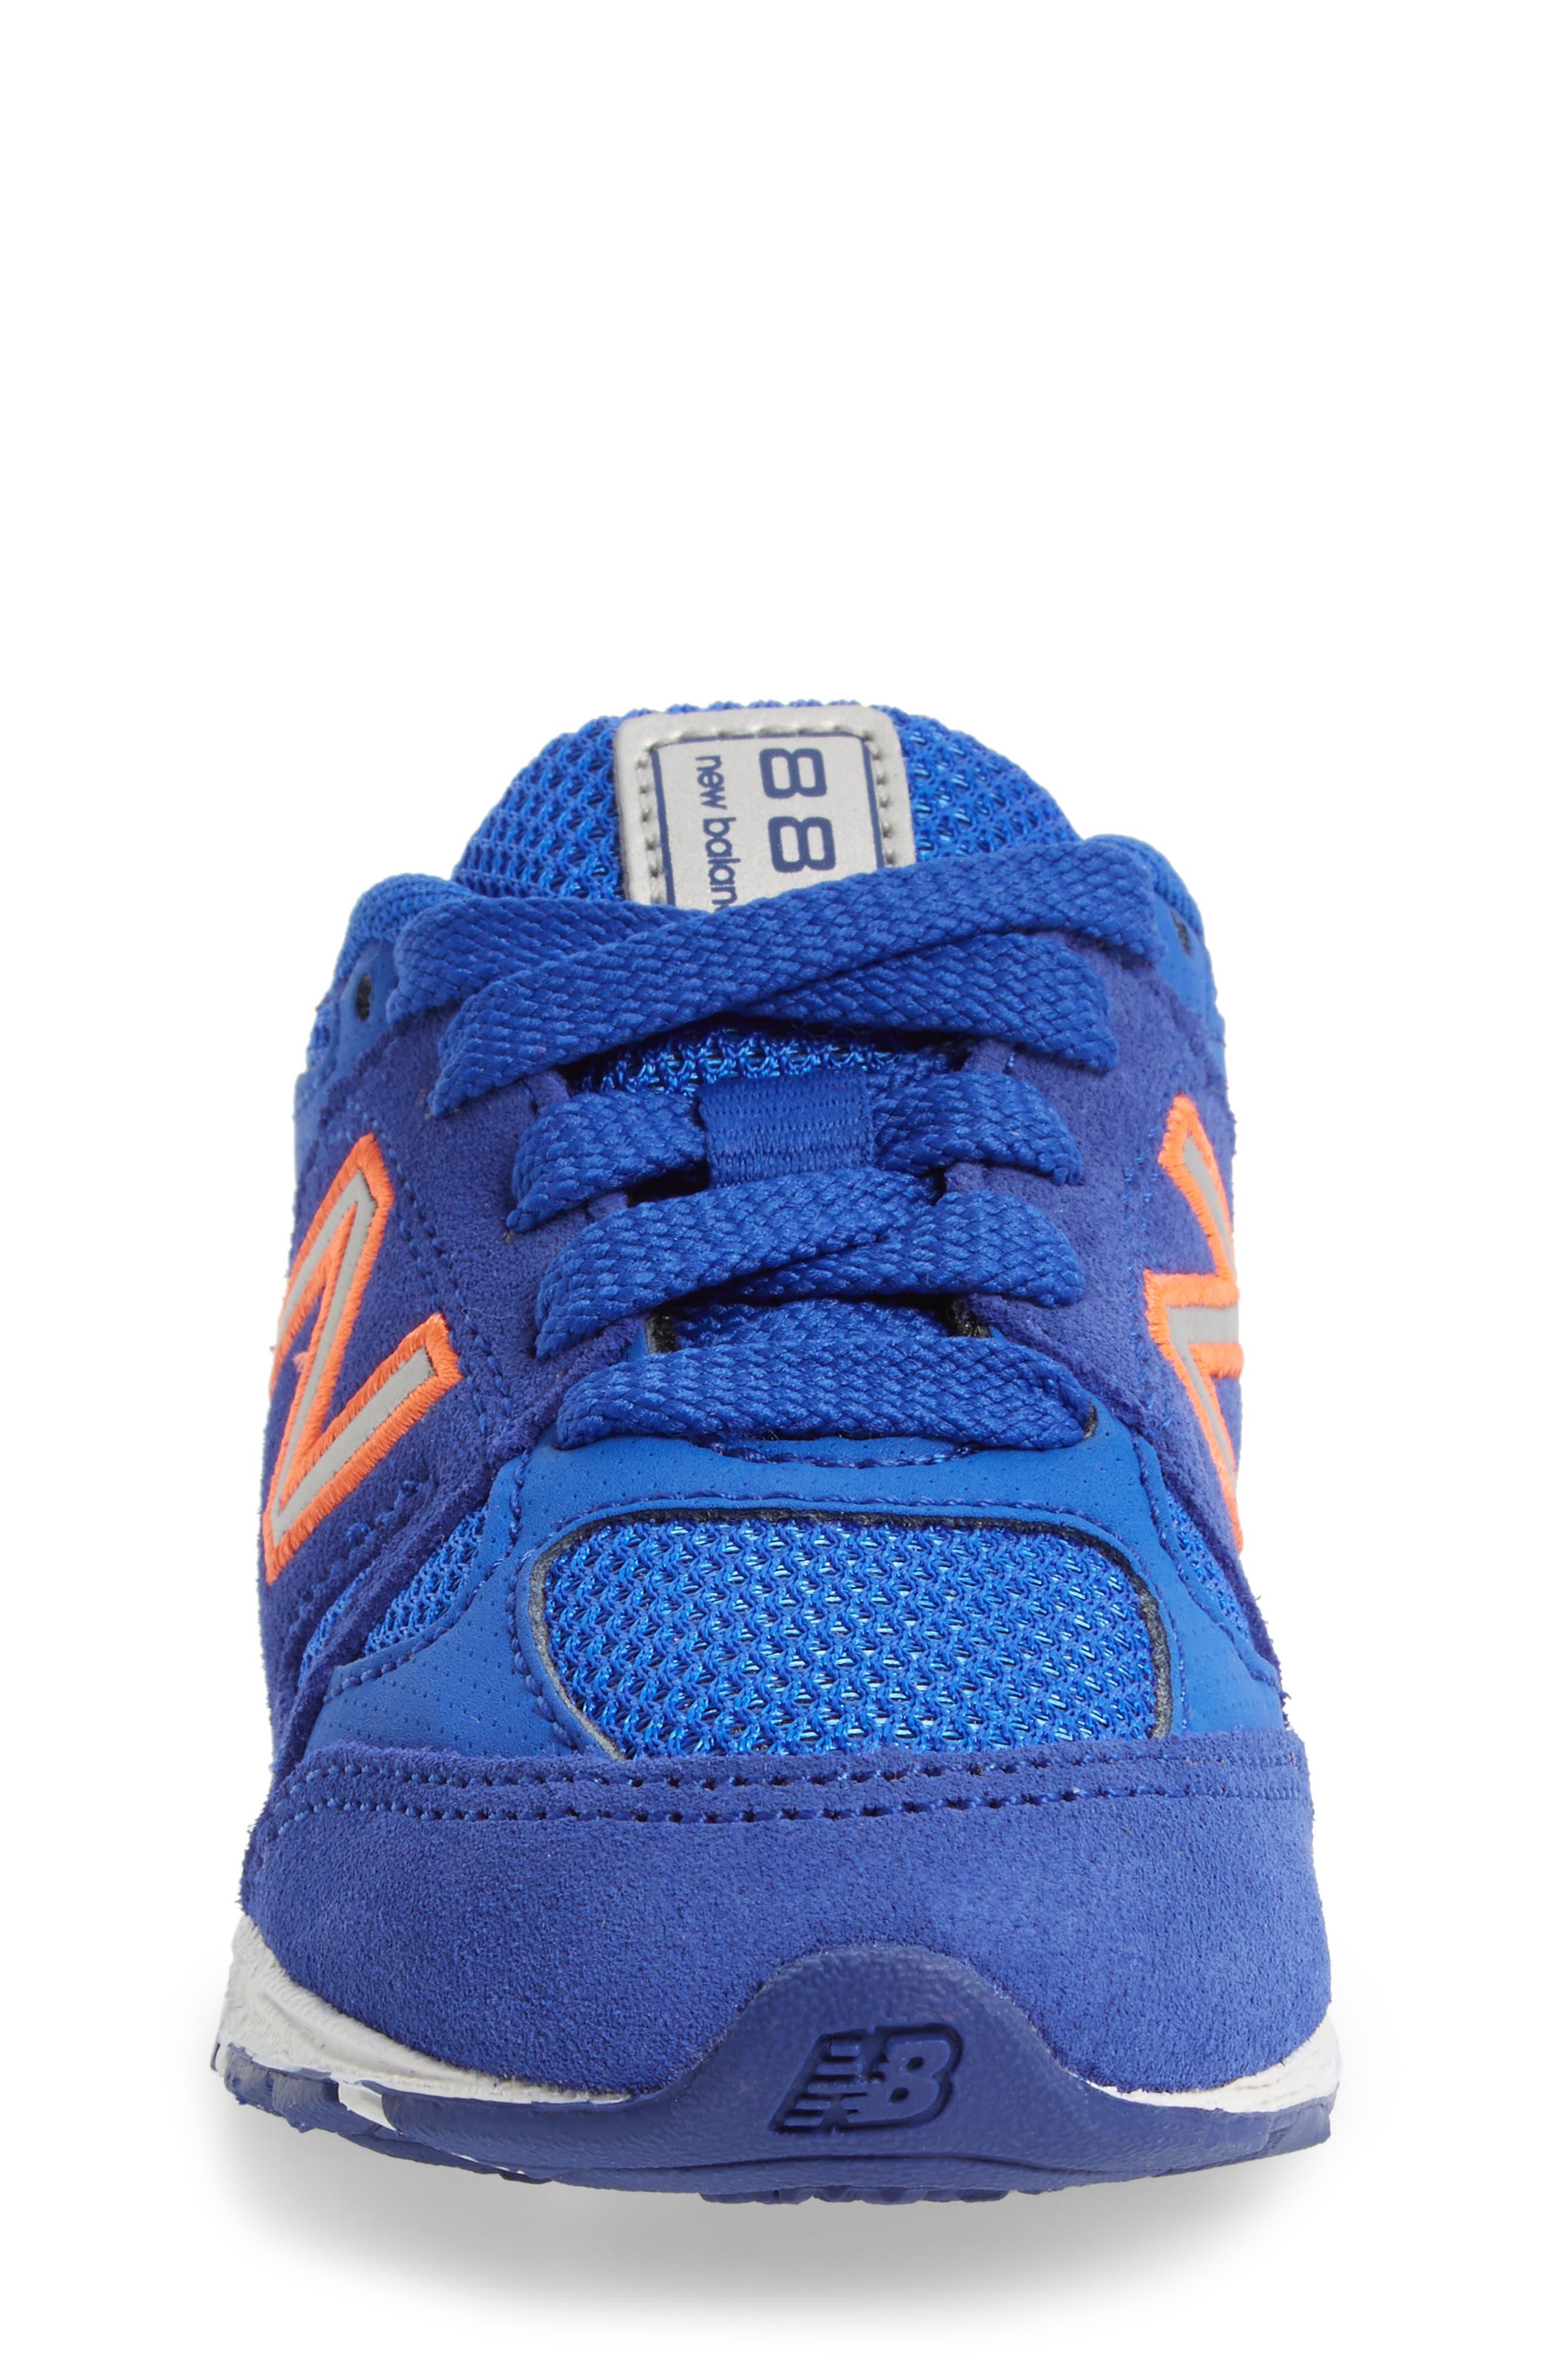 888 Sneaker,                             Alternate thumbnail 4, color,                             Pacific